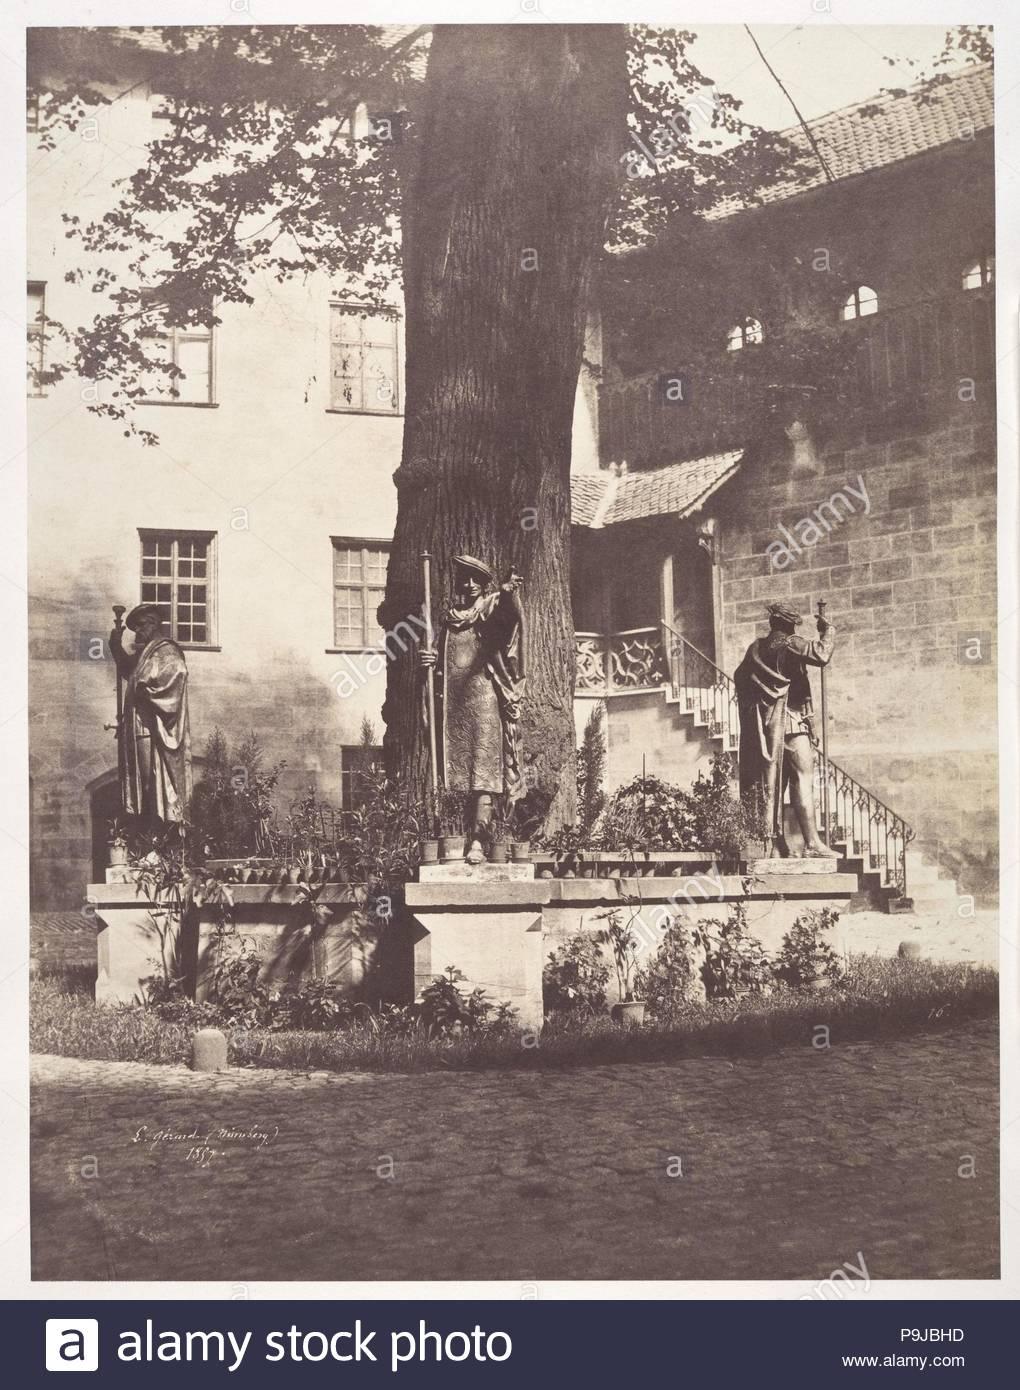 Nürnberg, Intérieur de la Cour du Burg Impérial, 1857, Eiweiß silber Drucken aus Glas negativ, Bild: 34,9 x 26,9 cm (13 3/4 x 10 9/16 in.), Fotografien, Léon Gérard (Französisch, 1817-1896). Stockbild